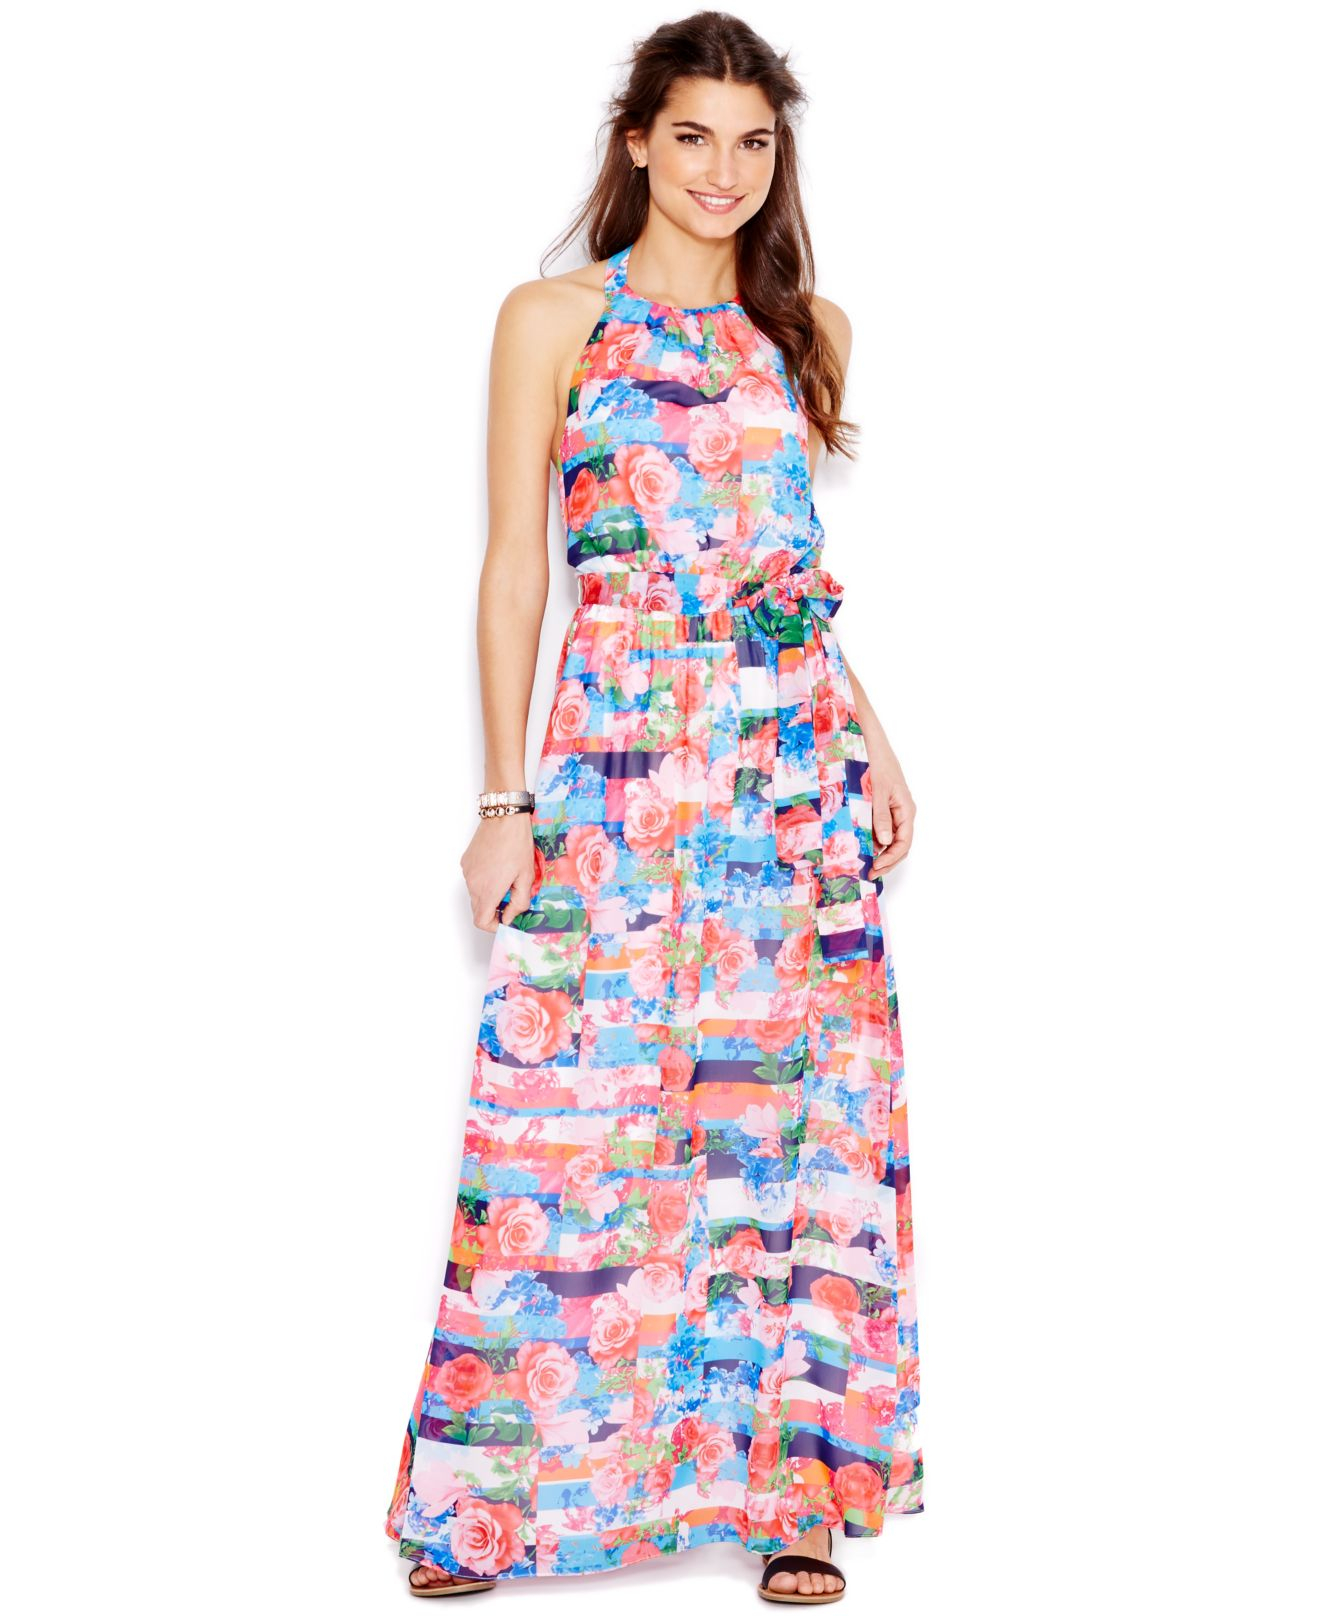 Jessica simpson Rose-print Halter Maxi Dress | Lyst